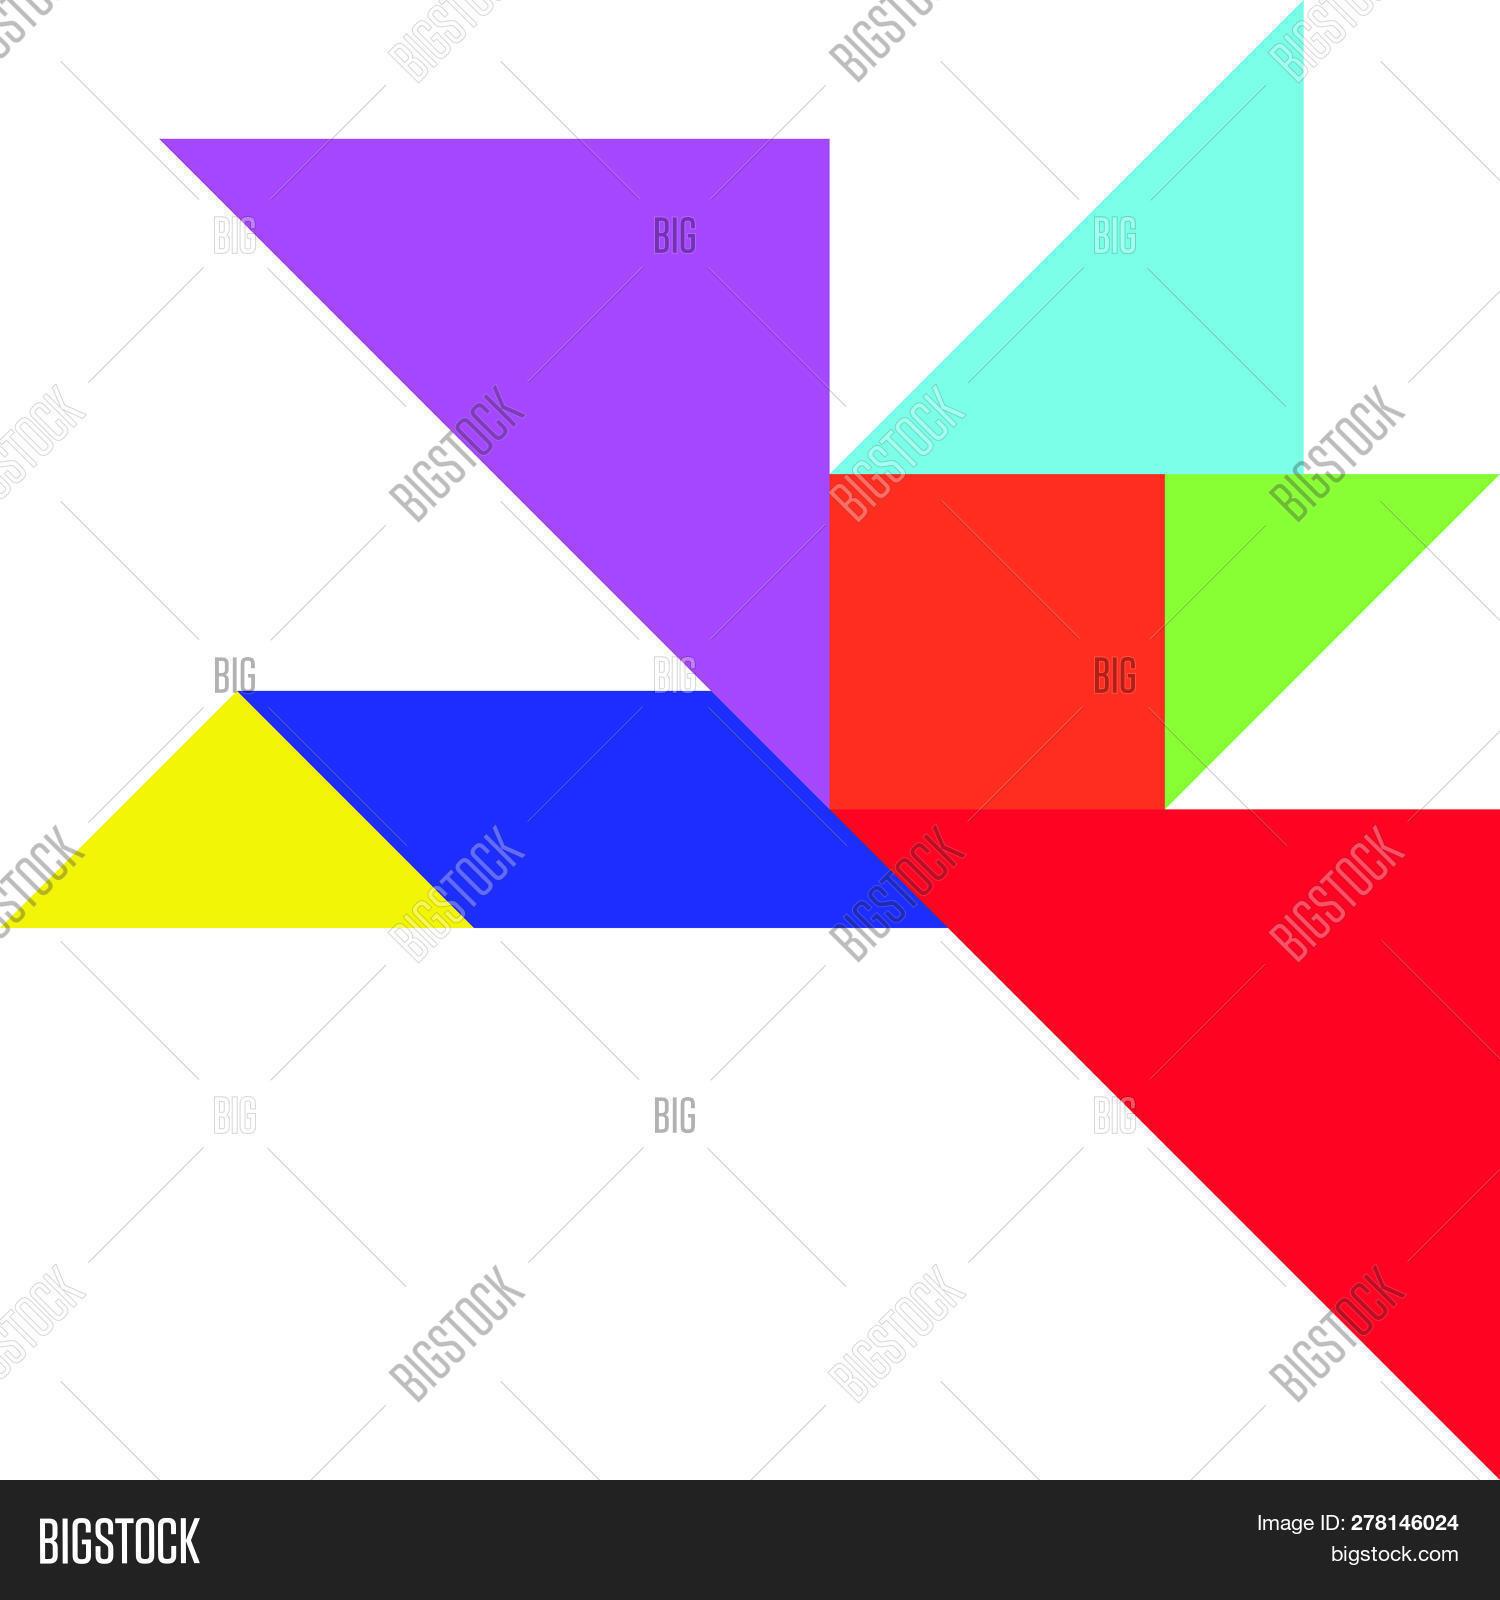 Color Tangram Puzzle Vector & Photo (Free Trial) | Bigstock dedans Tangram Chat